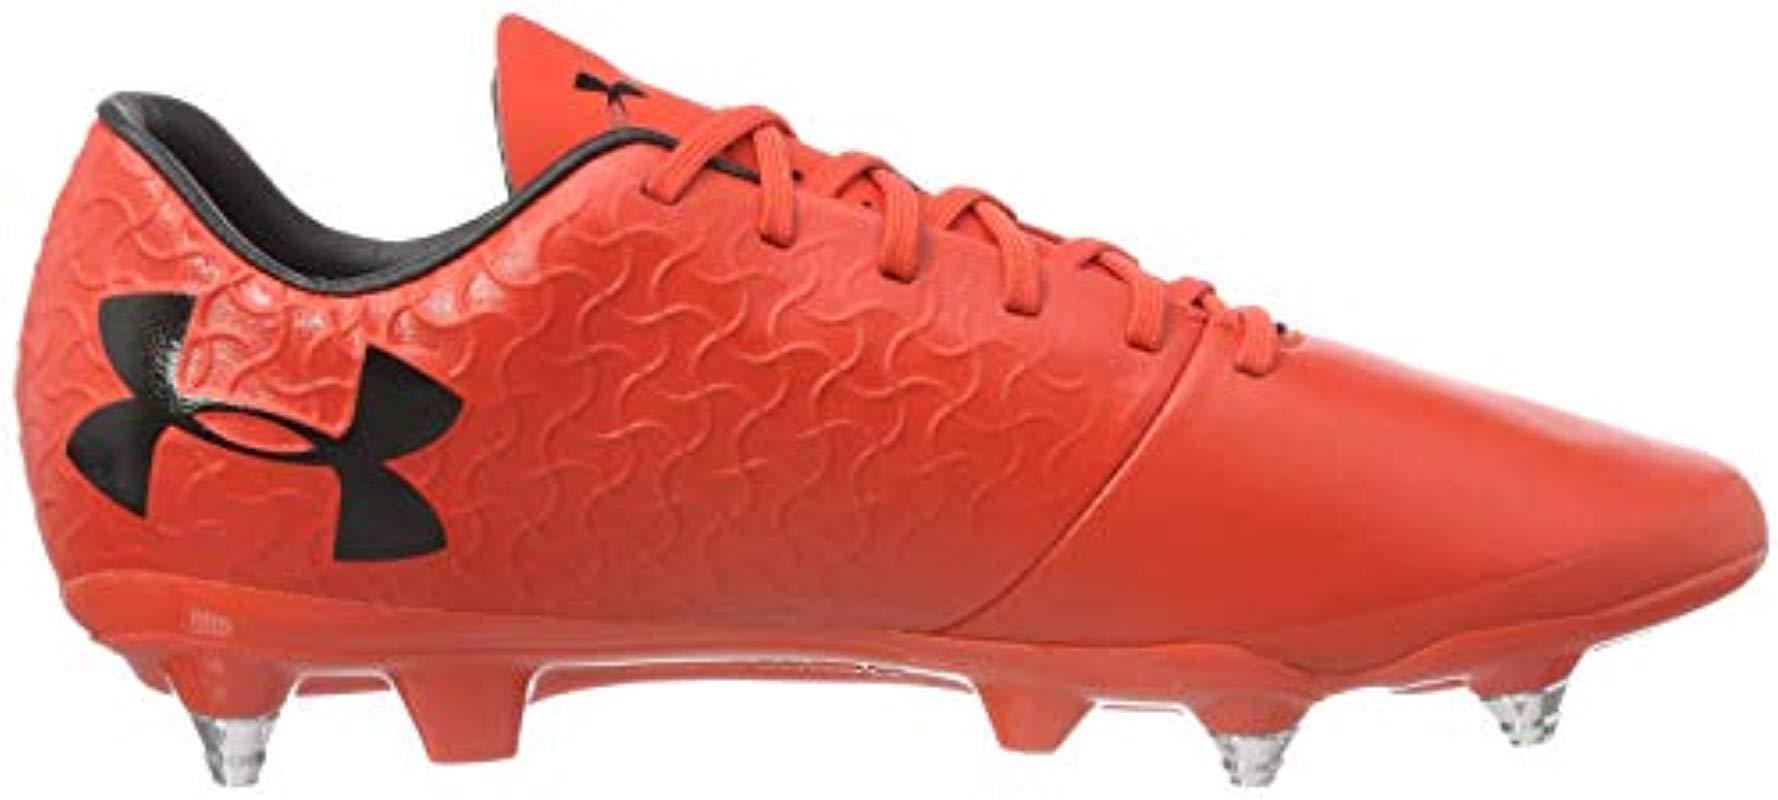 Homme Ua De Select Magnetico Coloris HybridChaussures Rouge Football xBedorC